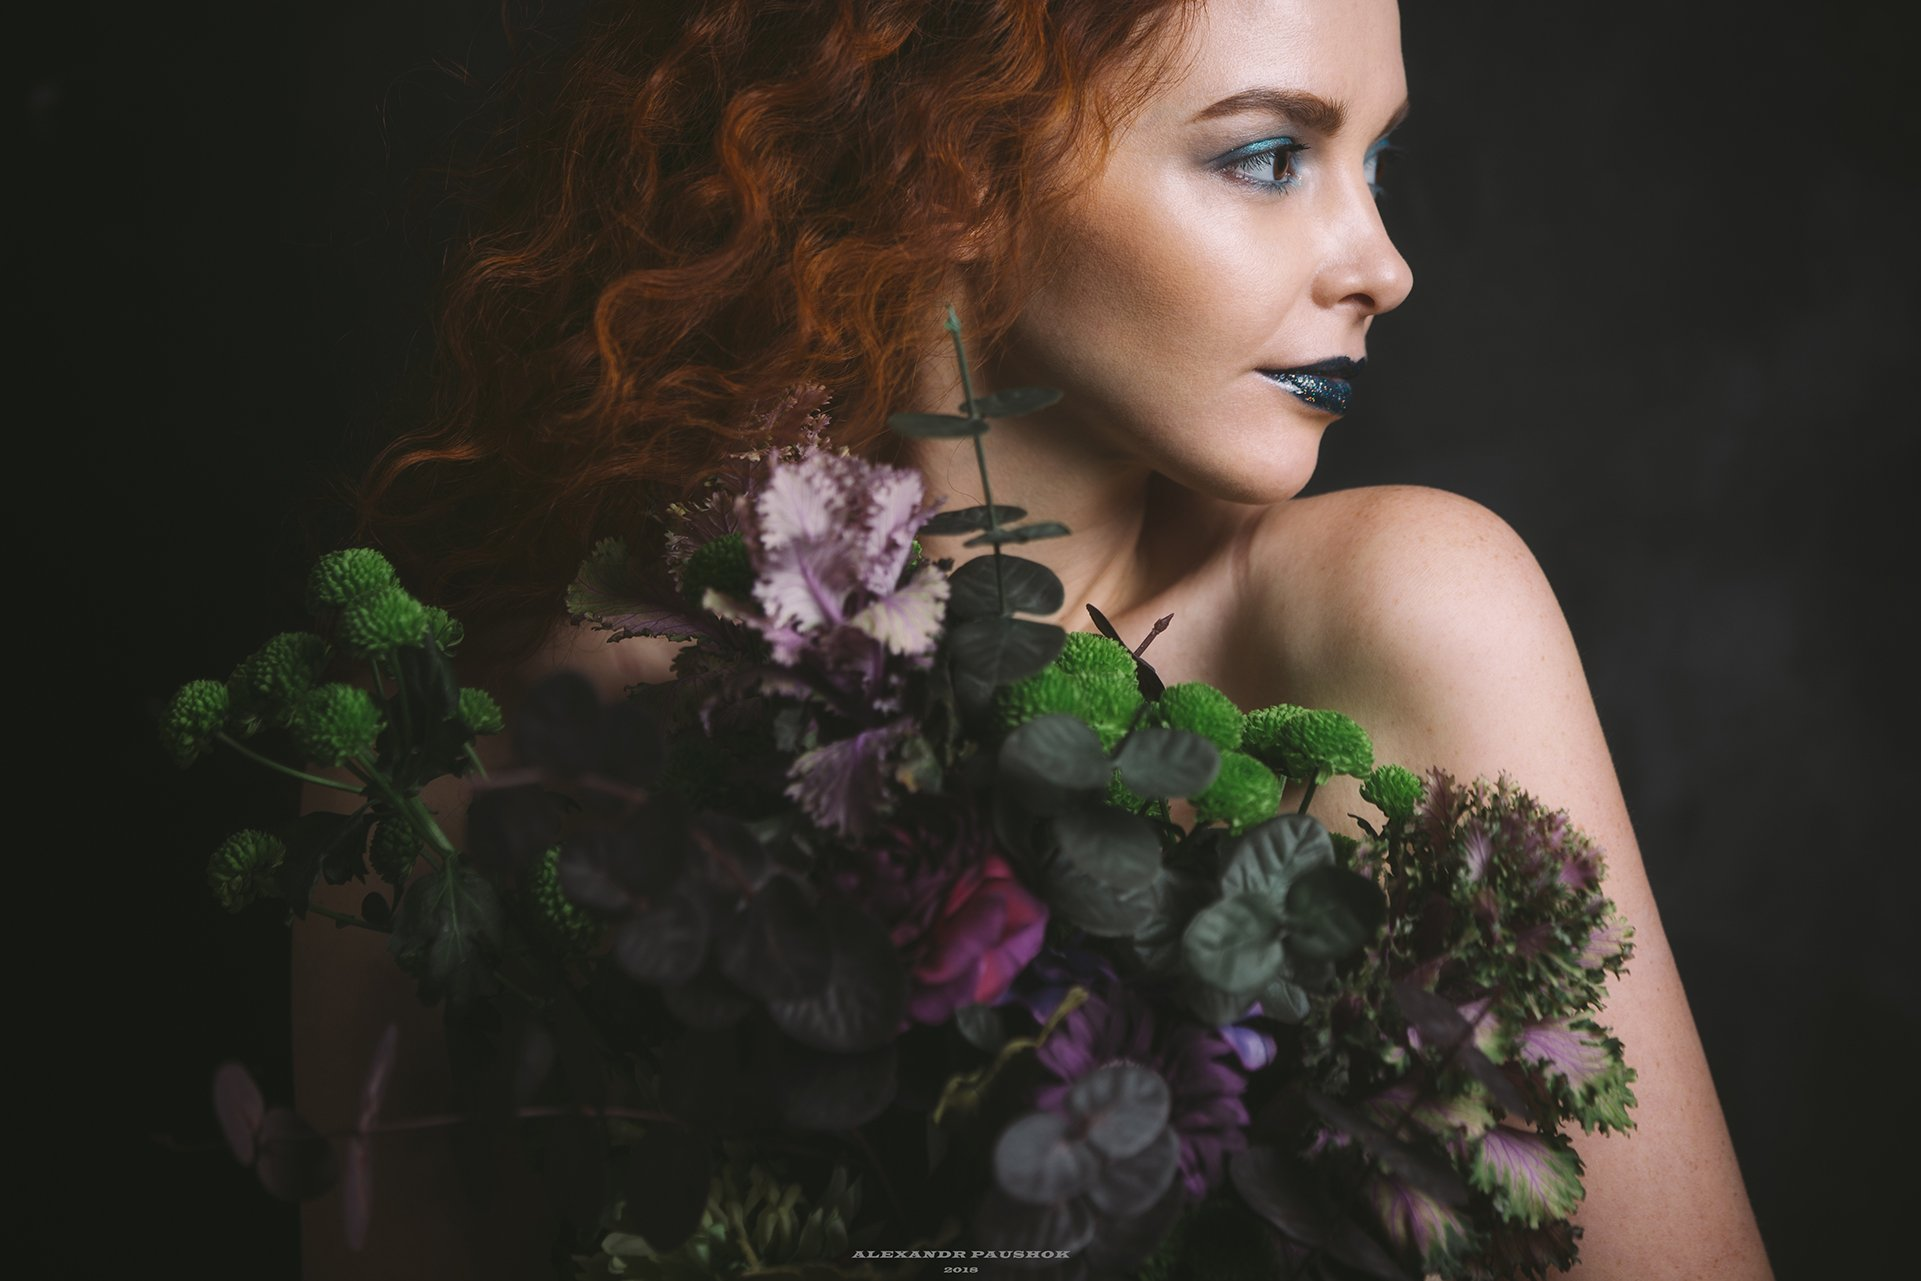 art, body, girl, skin, beauty, flowers, portrait, Paushok Alexander